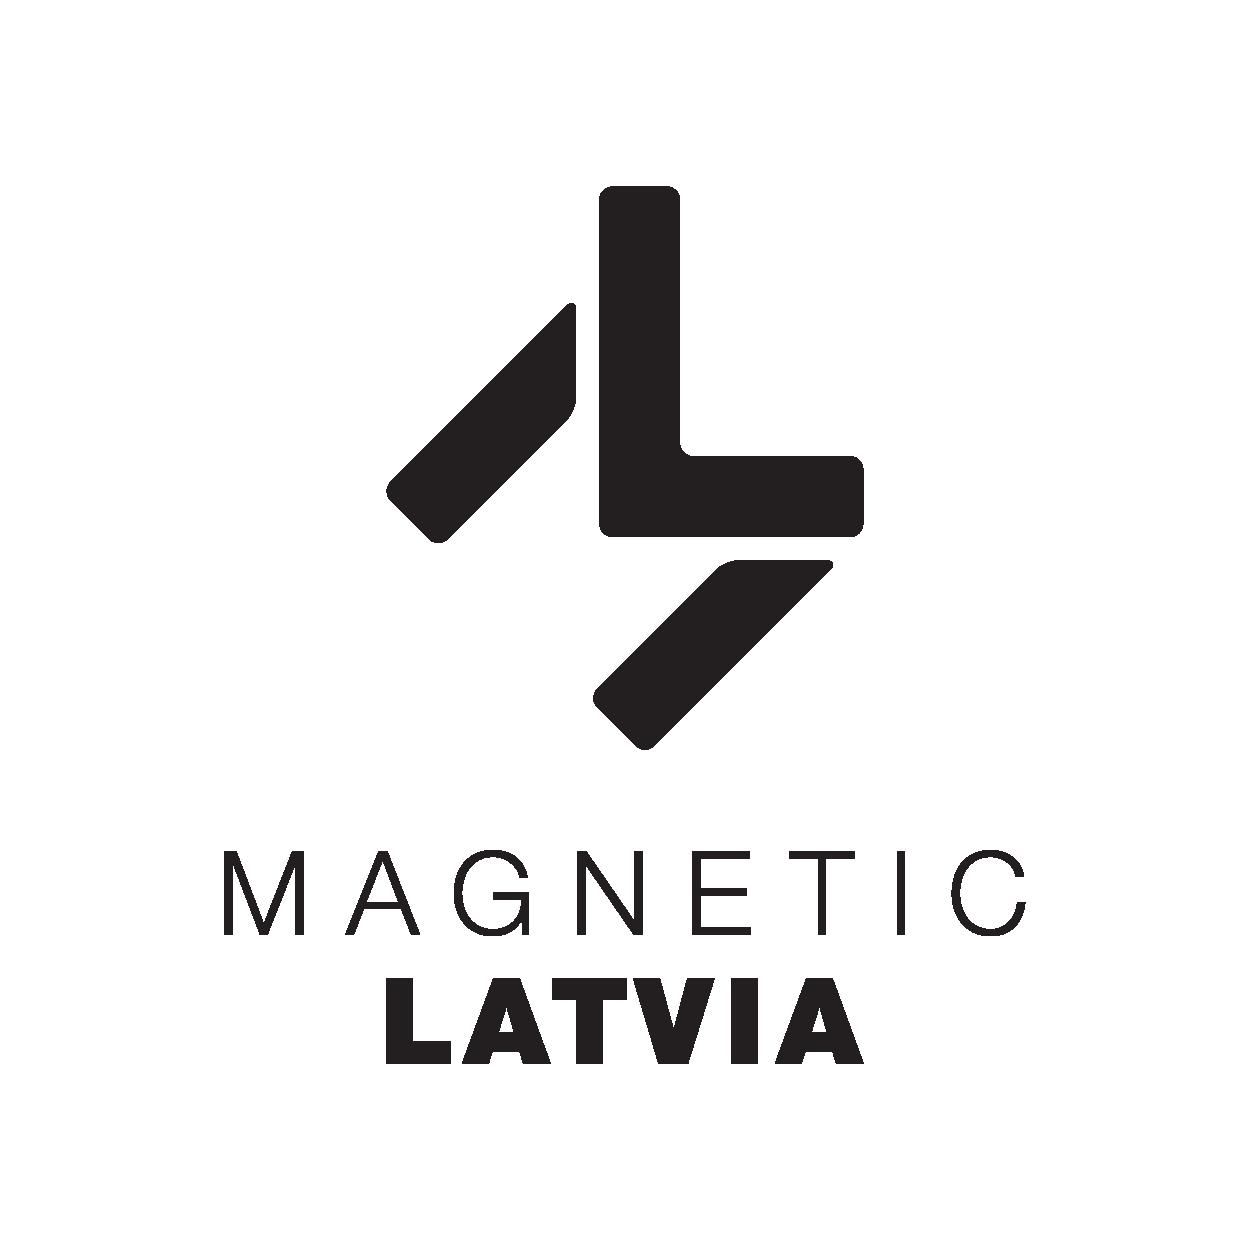 magneticlatvia